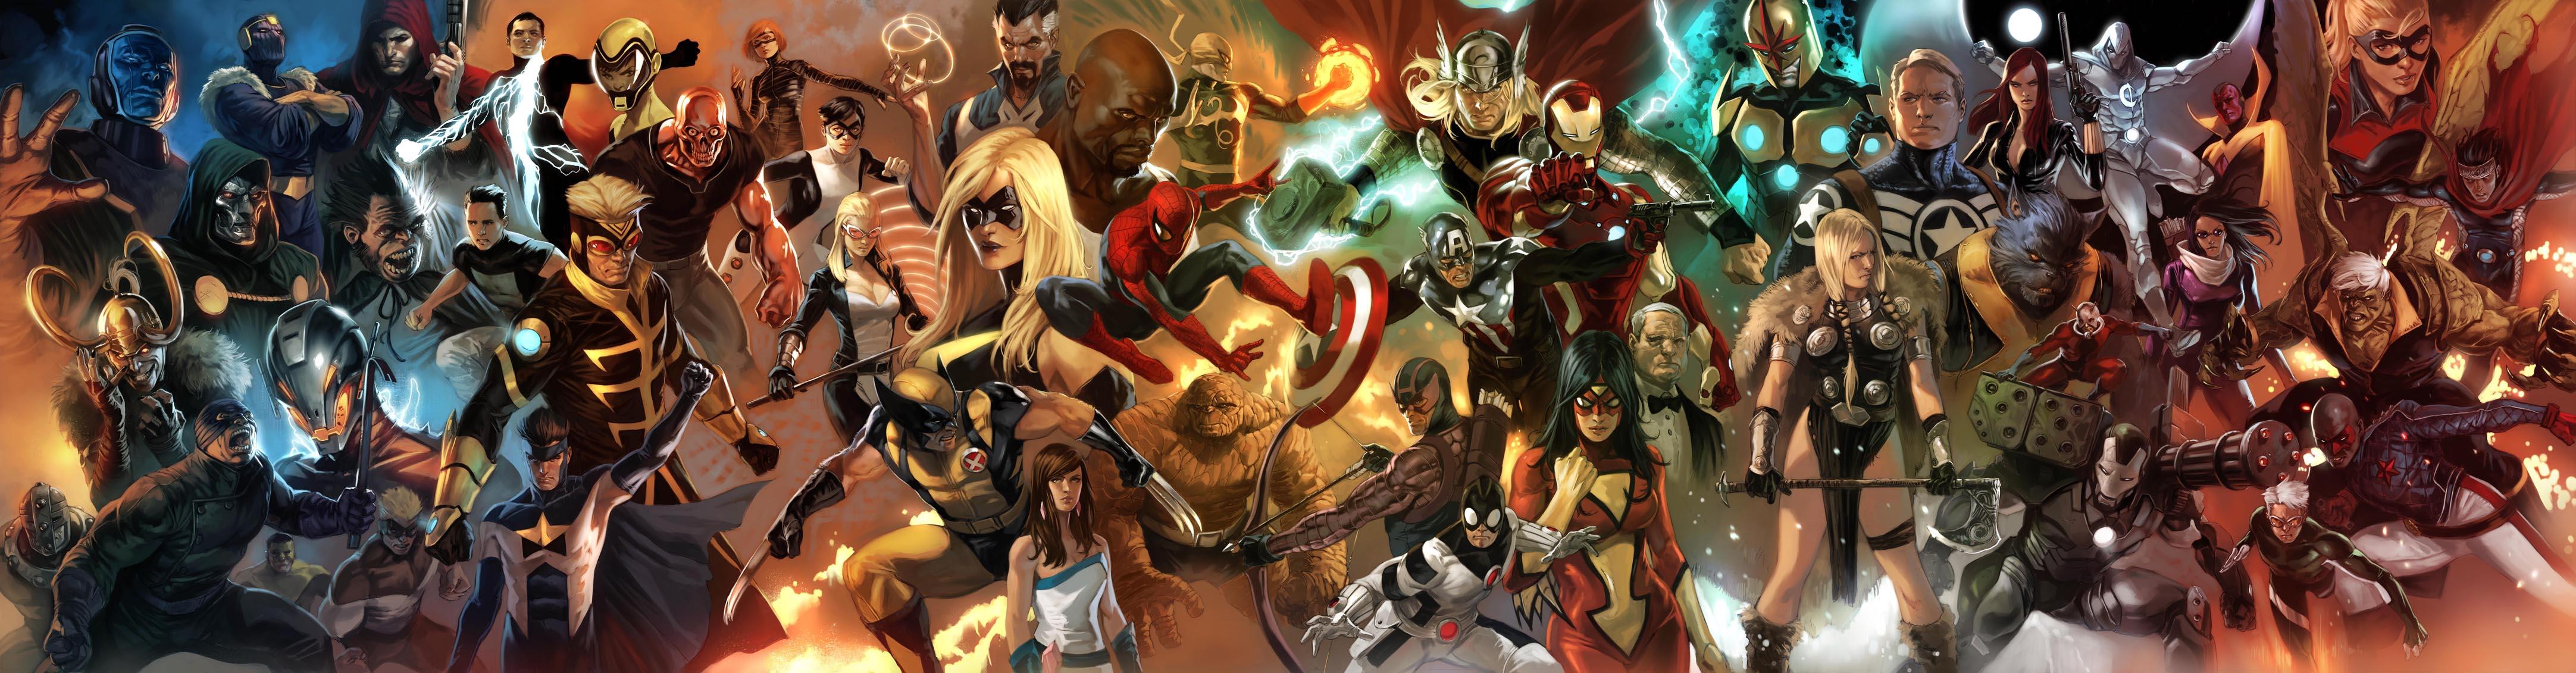 43 Marvel Dual Monitor Wallpaper On Wallpapersafari